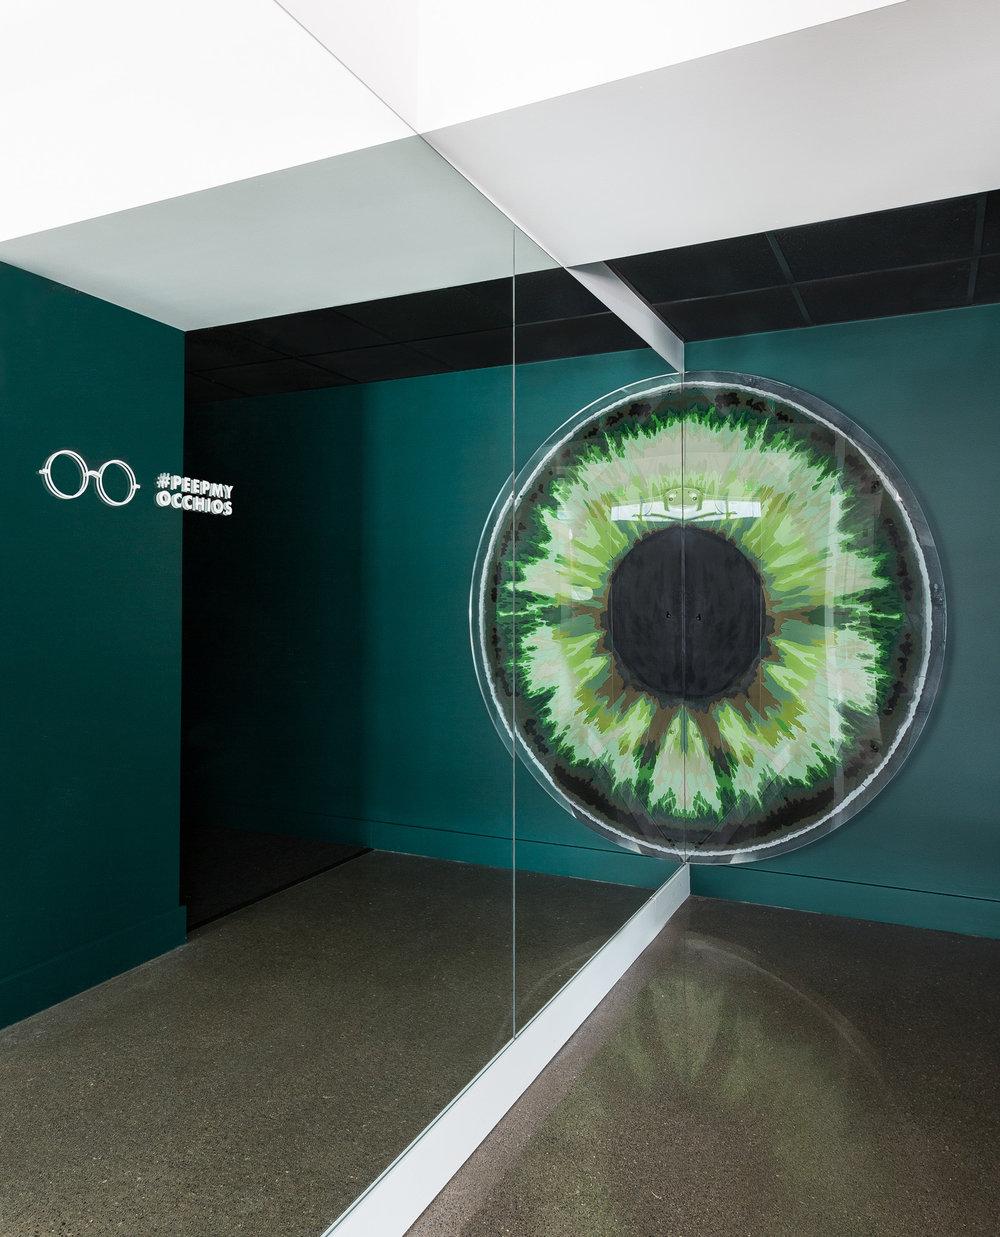 michelle-dirkse-commercial-optometry-office-3.jpg